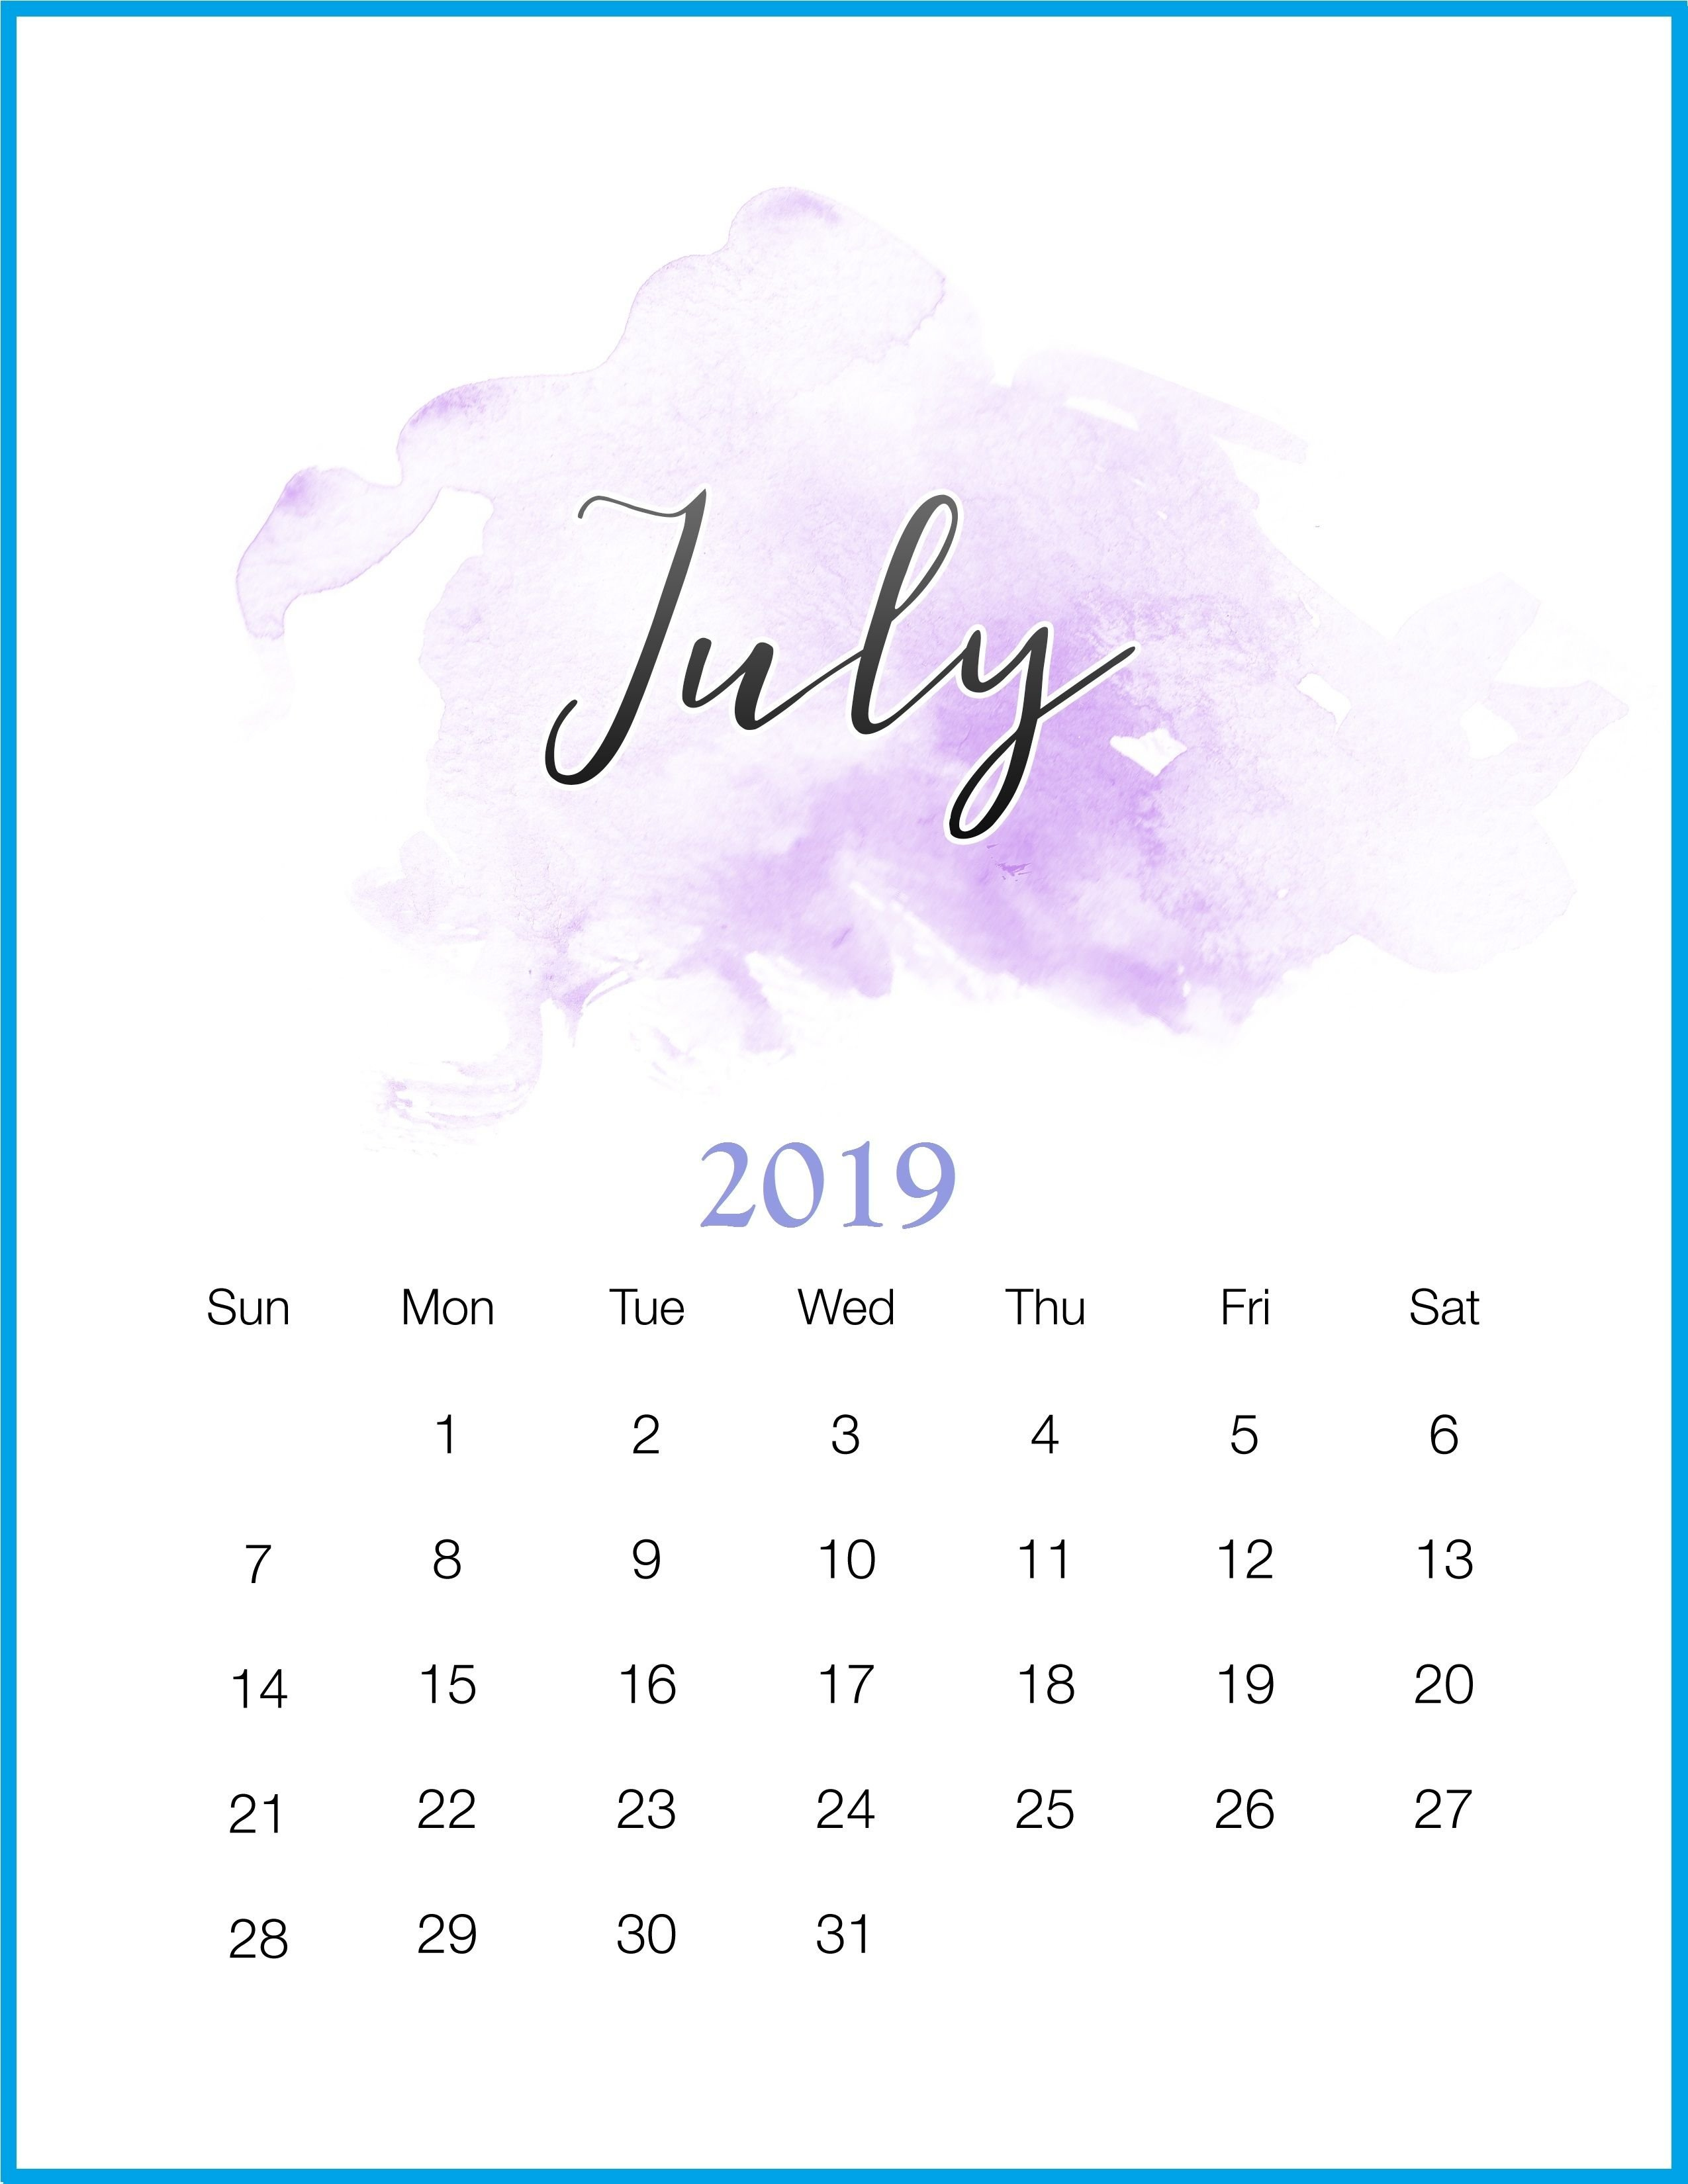 July 2019 Calendar Wallpapers – Wallpaper Cave July 1 2019 Calendar